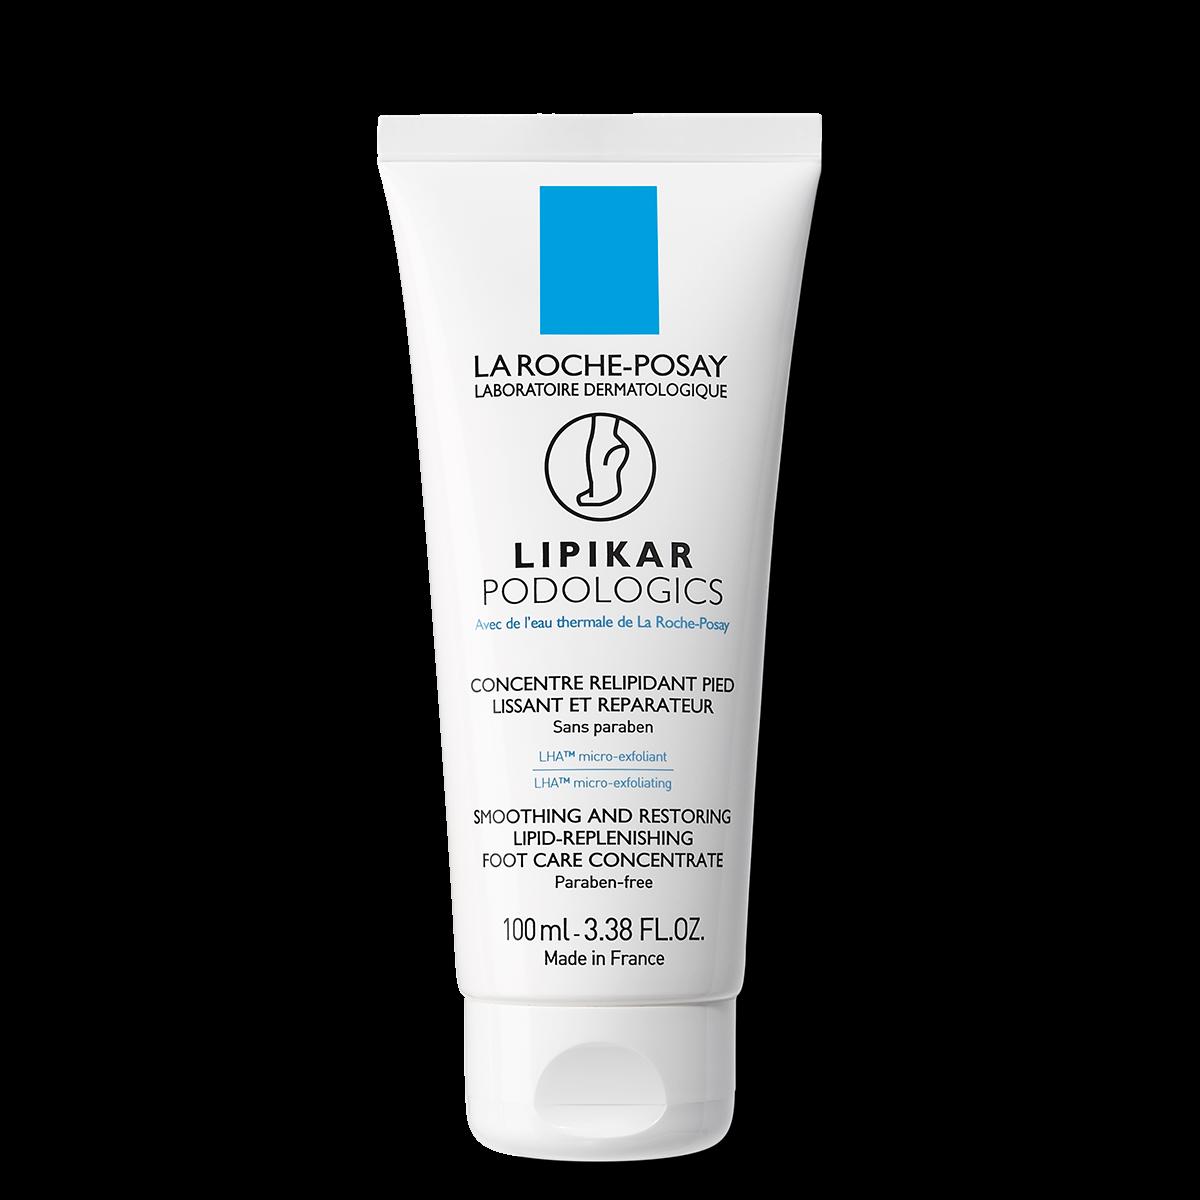 La Roche Posay ProductPage Eczema Lipikar Podologics 100ml 34334224082